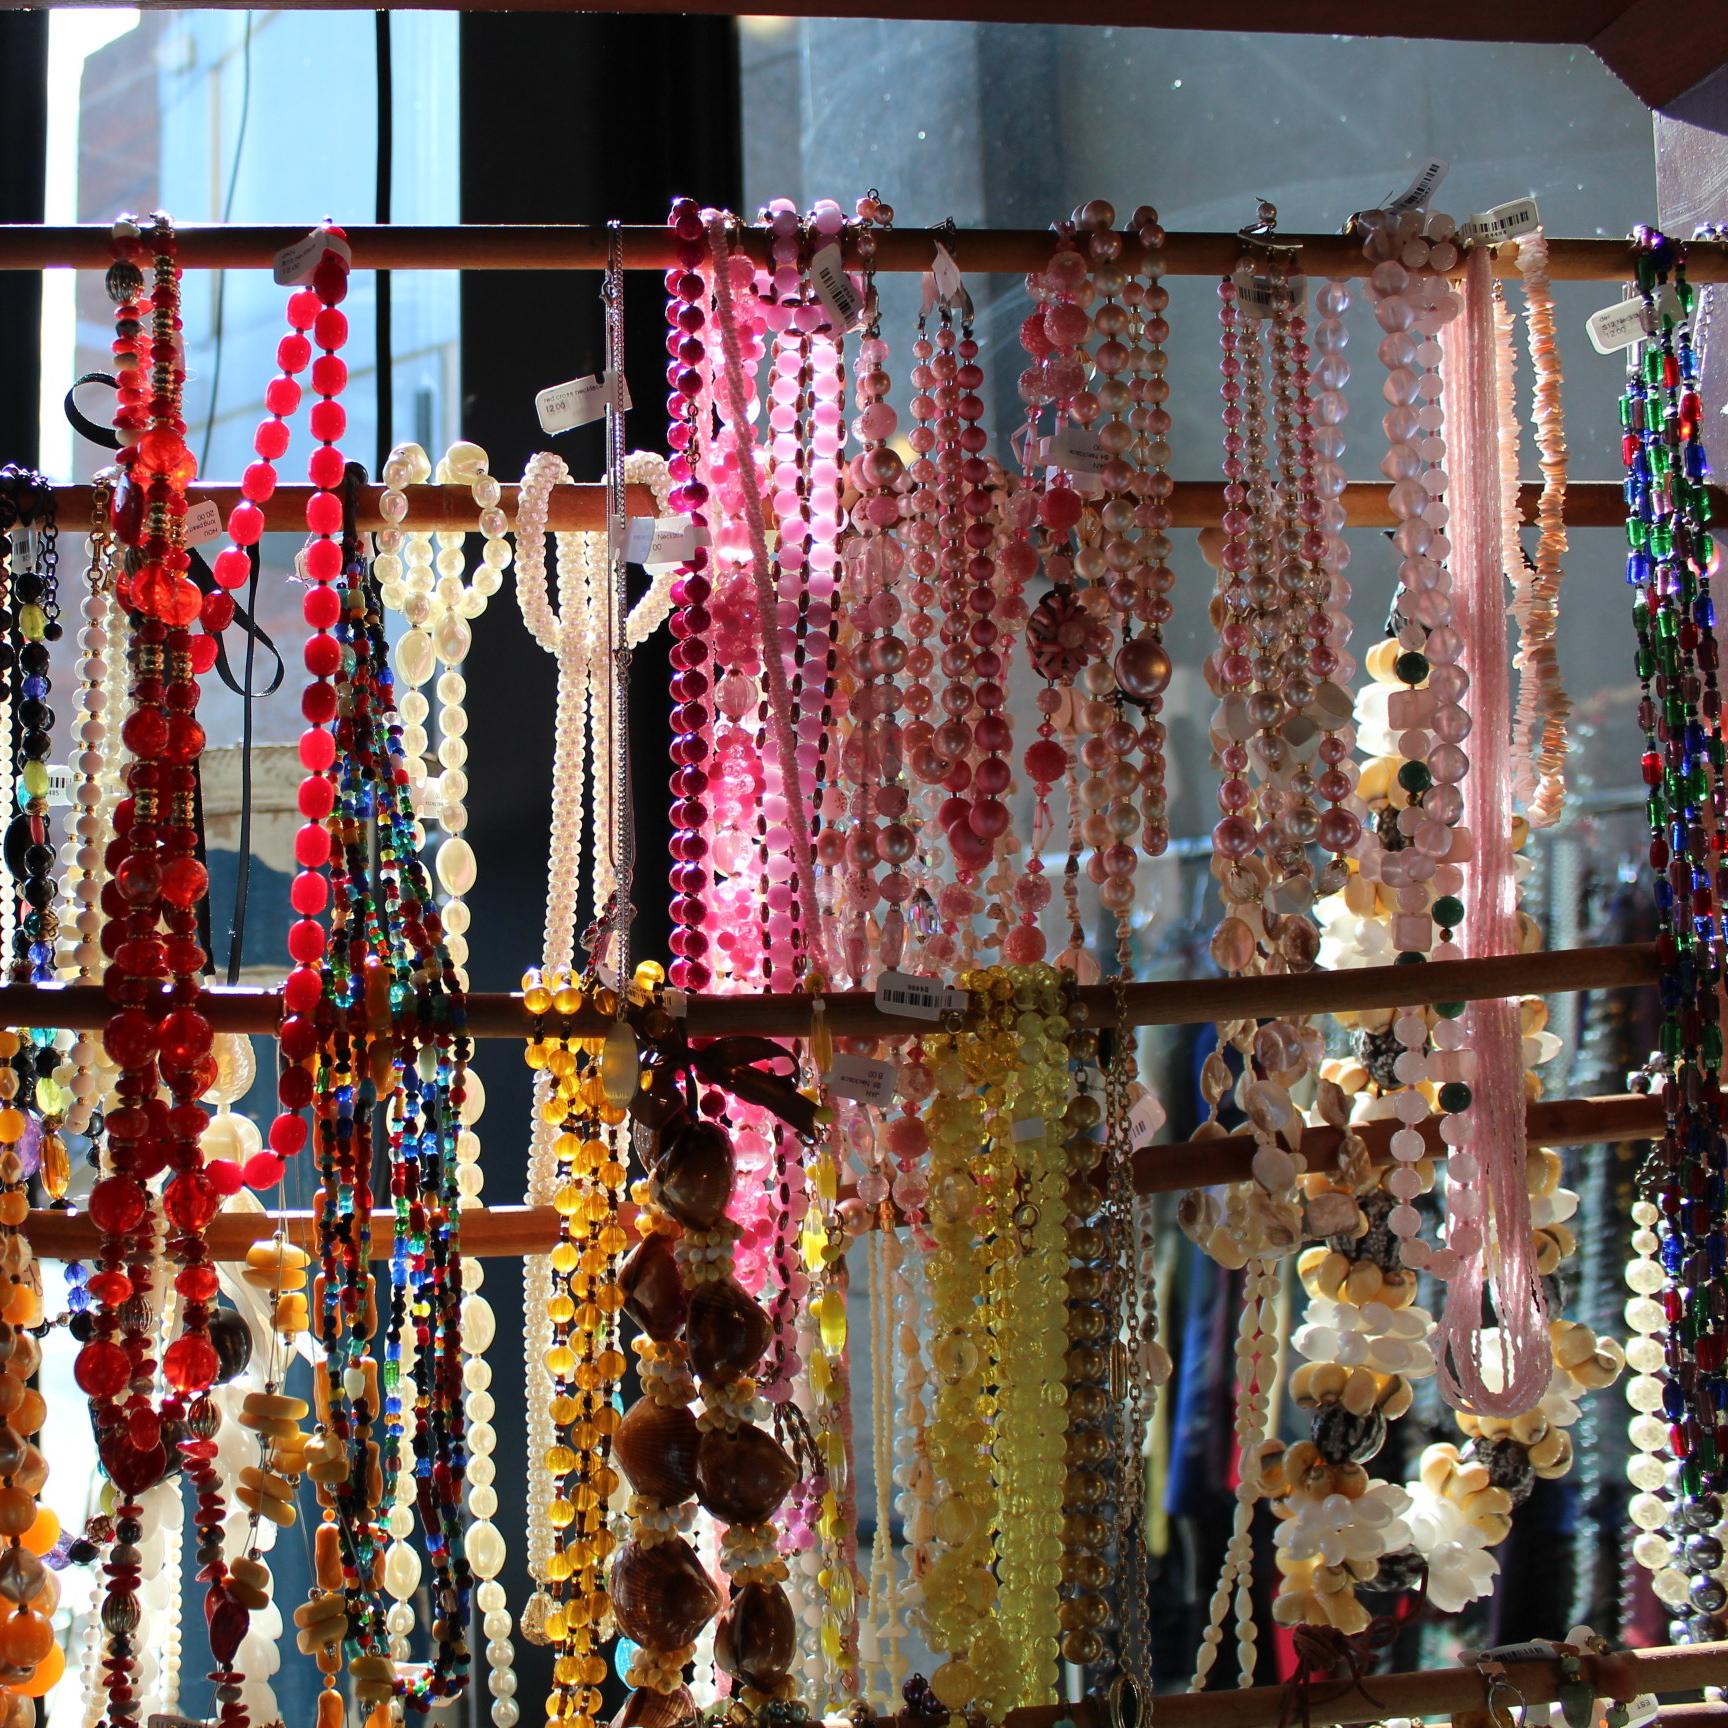 A Rainbow of Beads